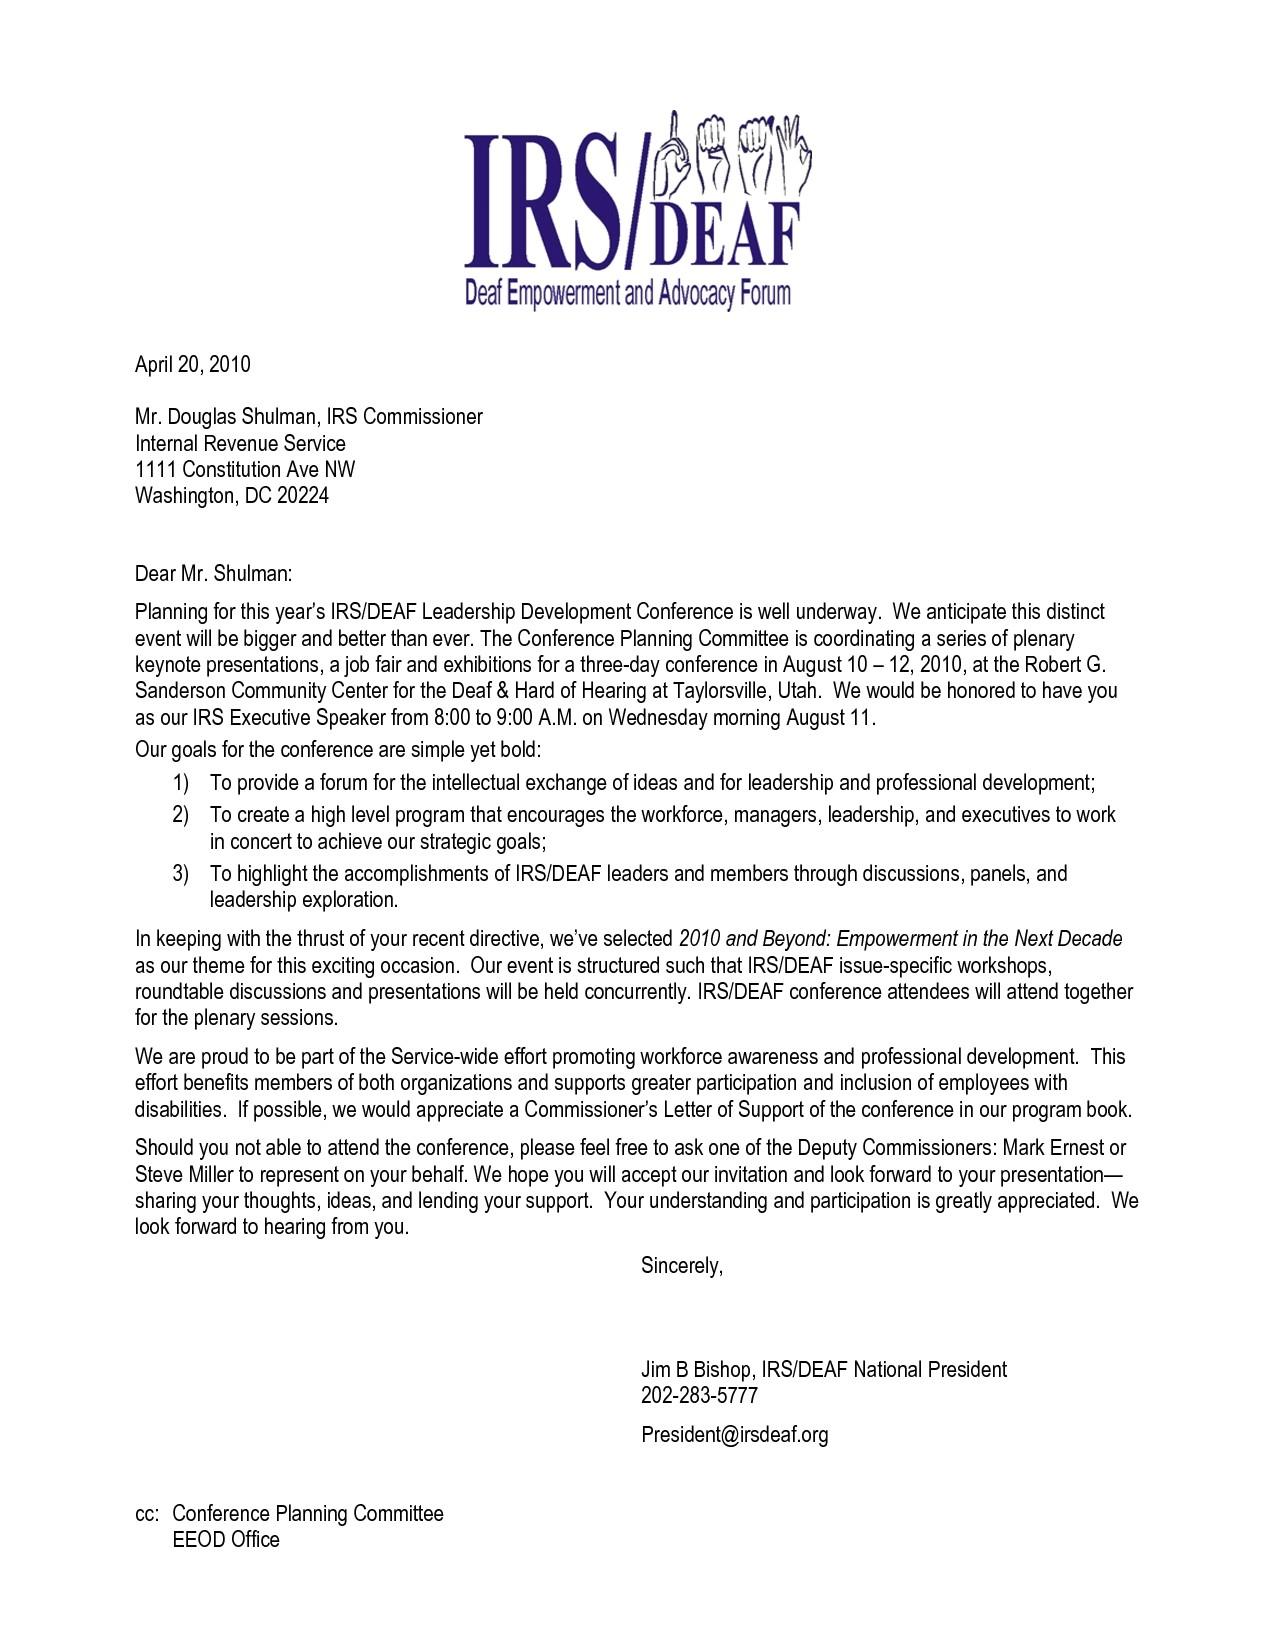 invitation letter guest speaker graduation ceremony